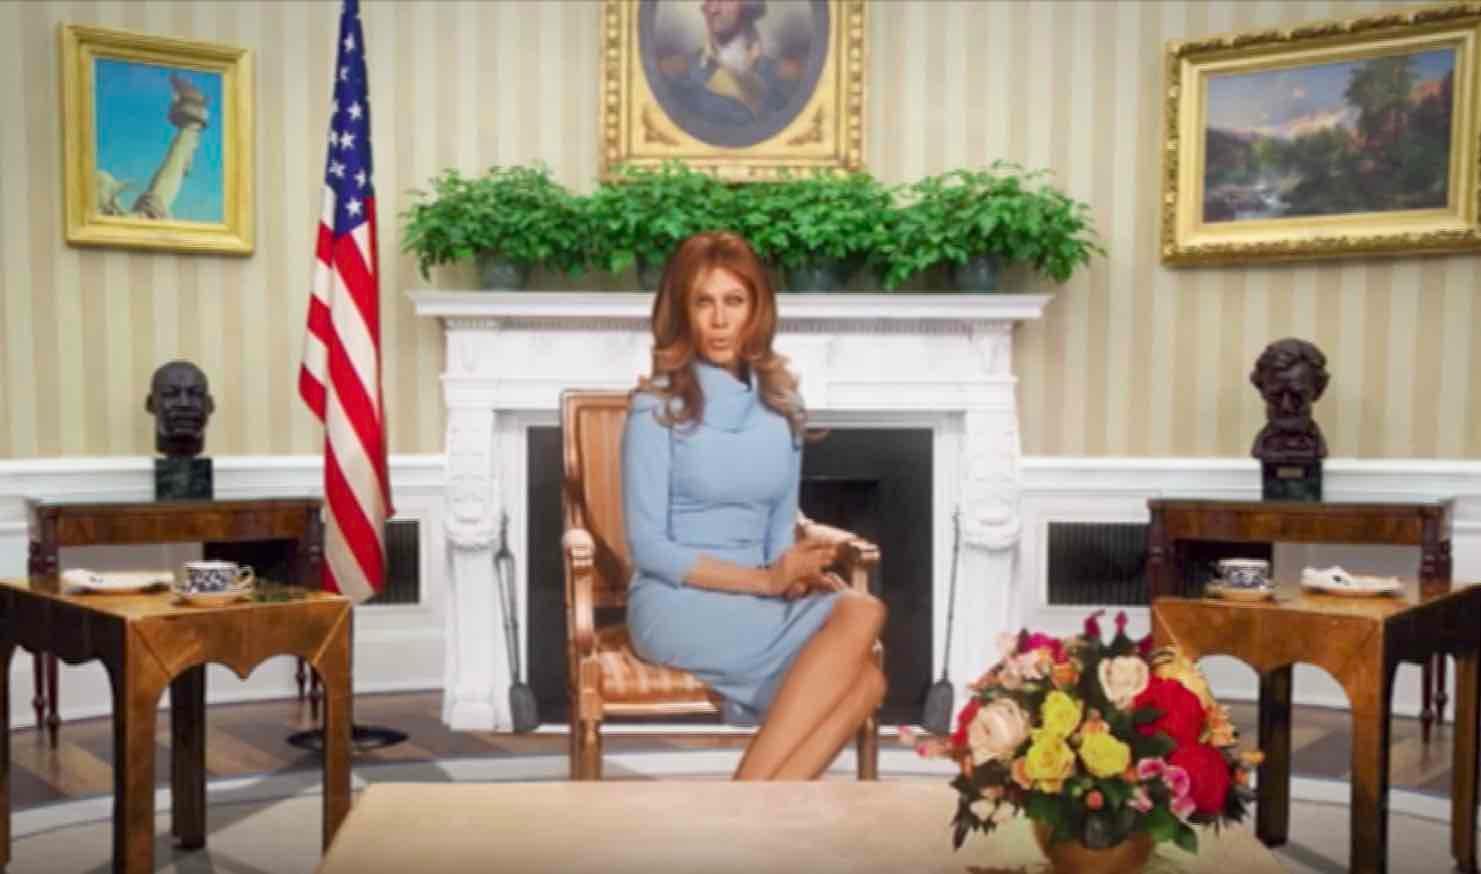 Virginia Raffaele imita Melania Trump